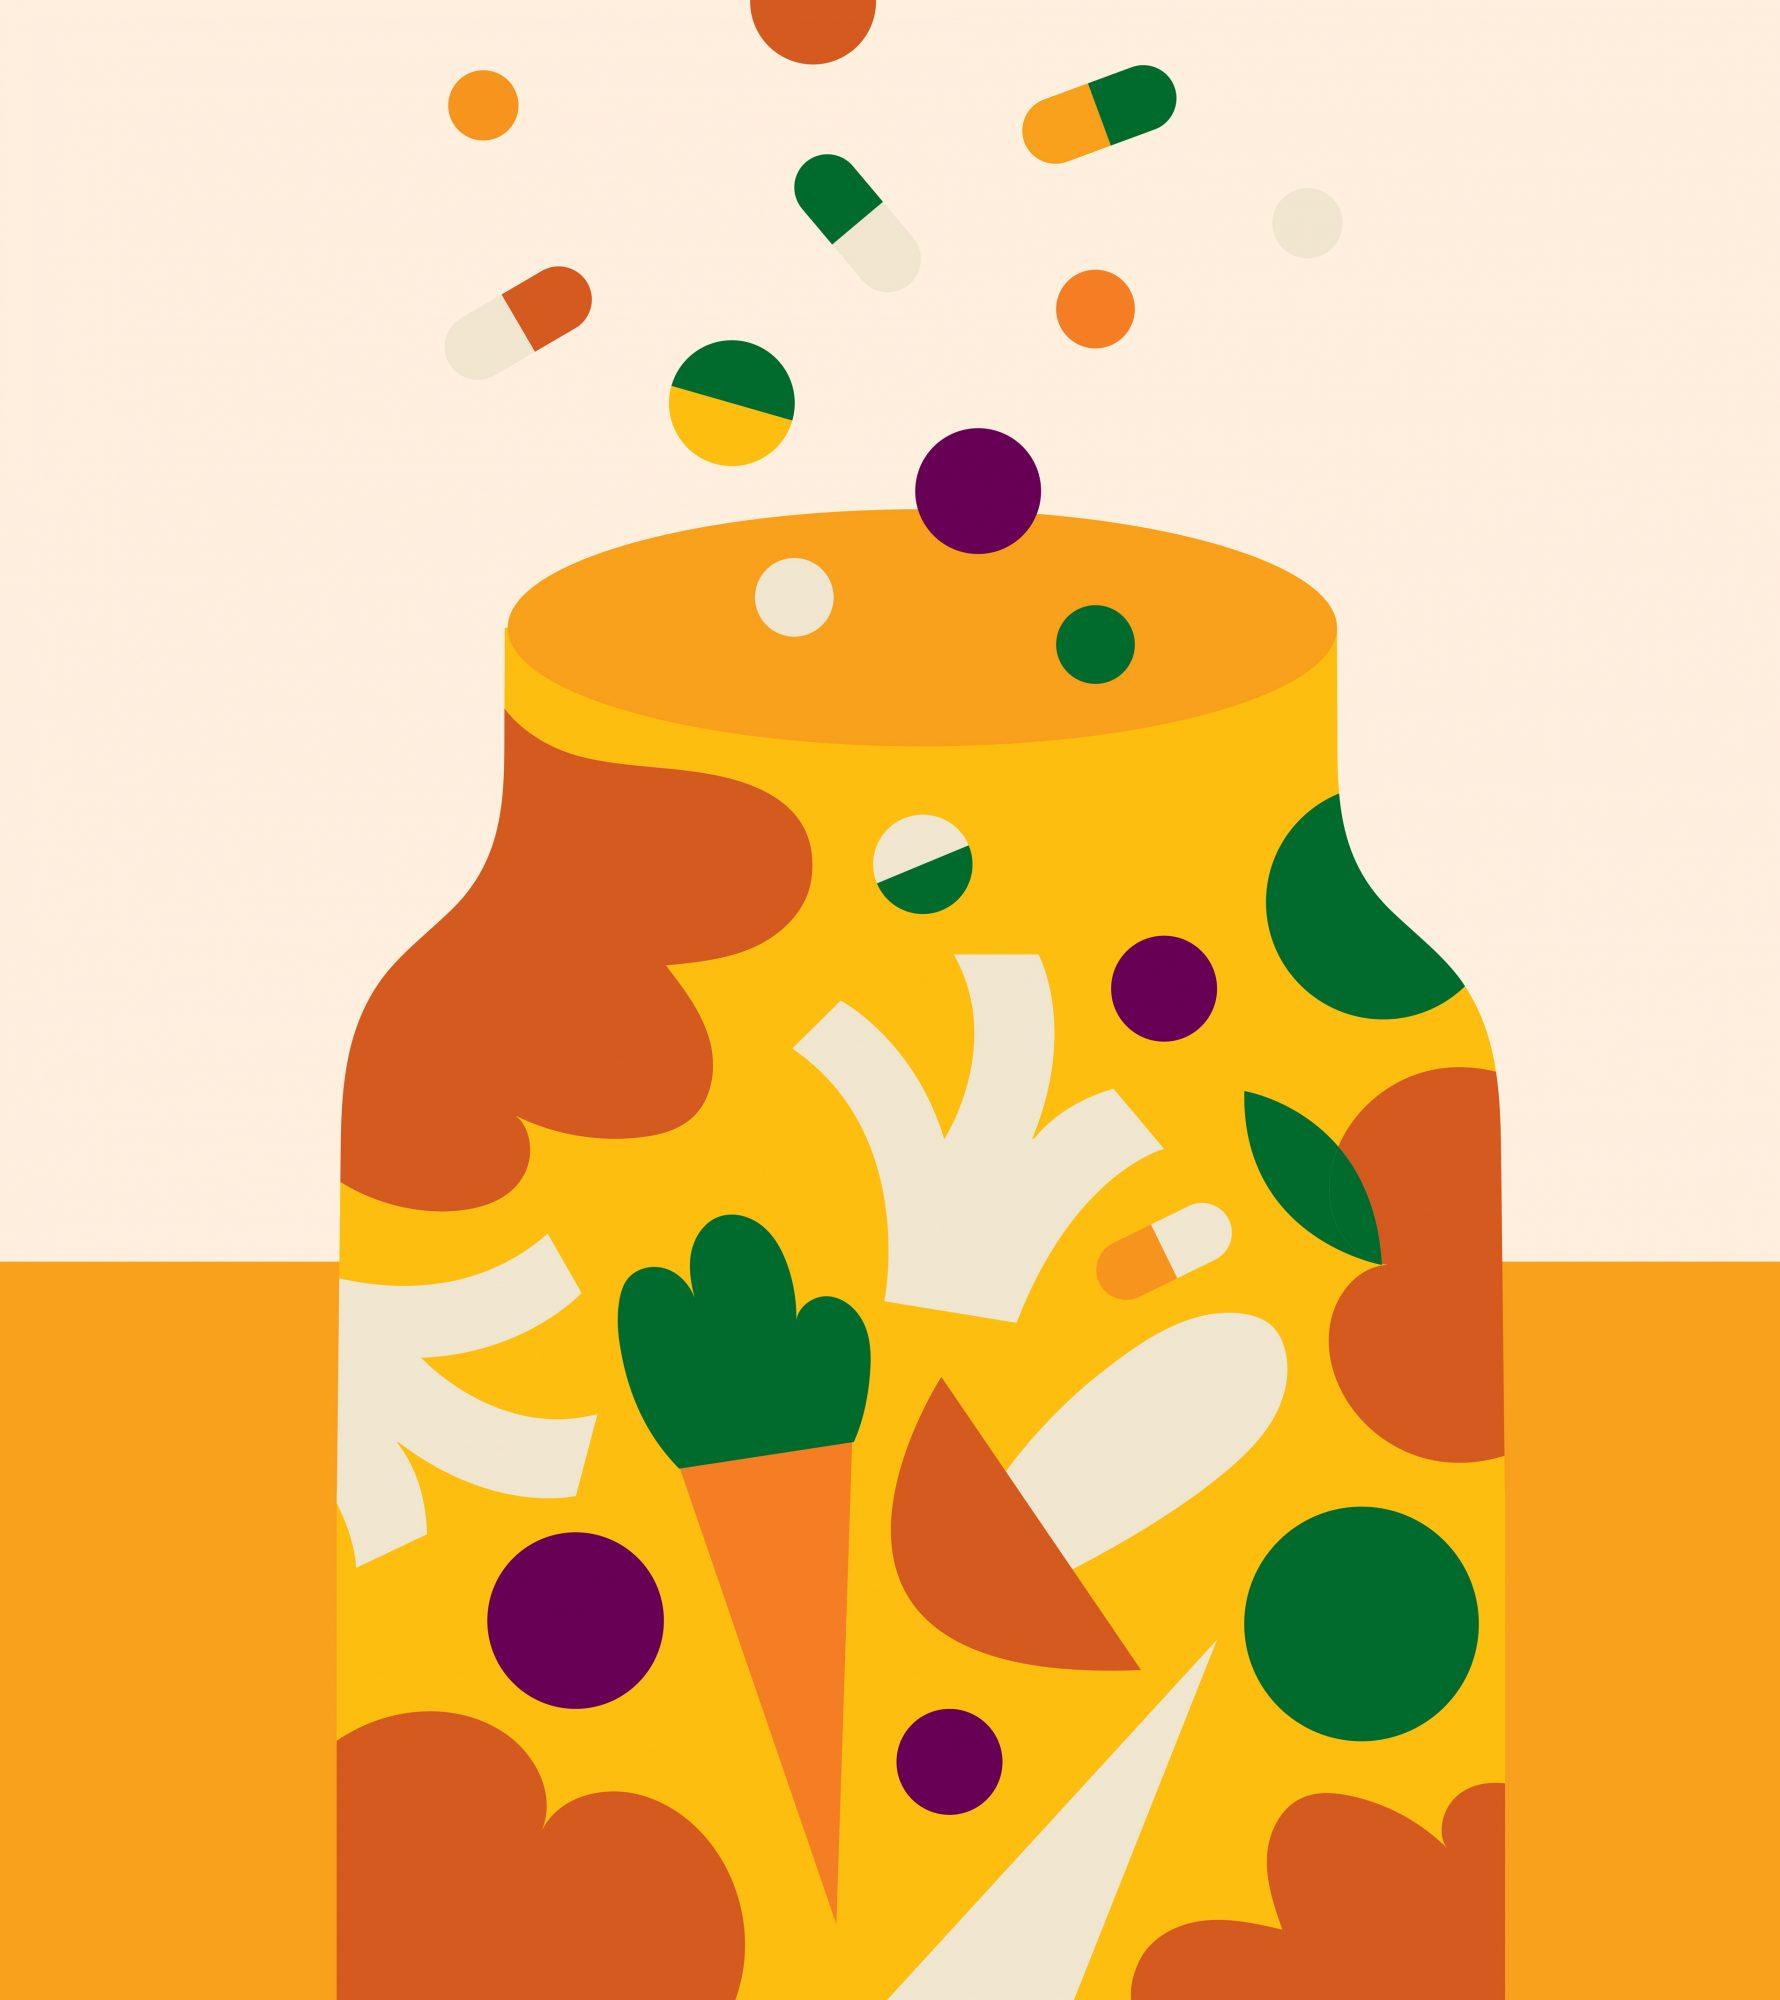 vitamin and supplement jar